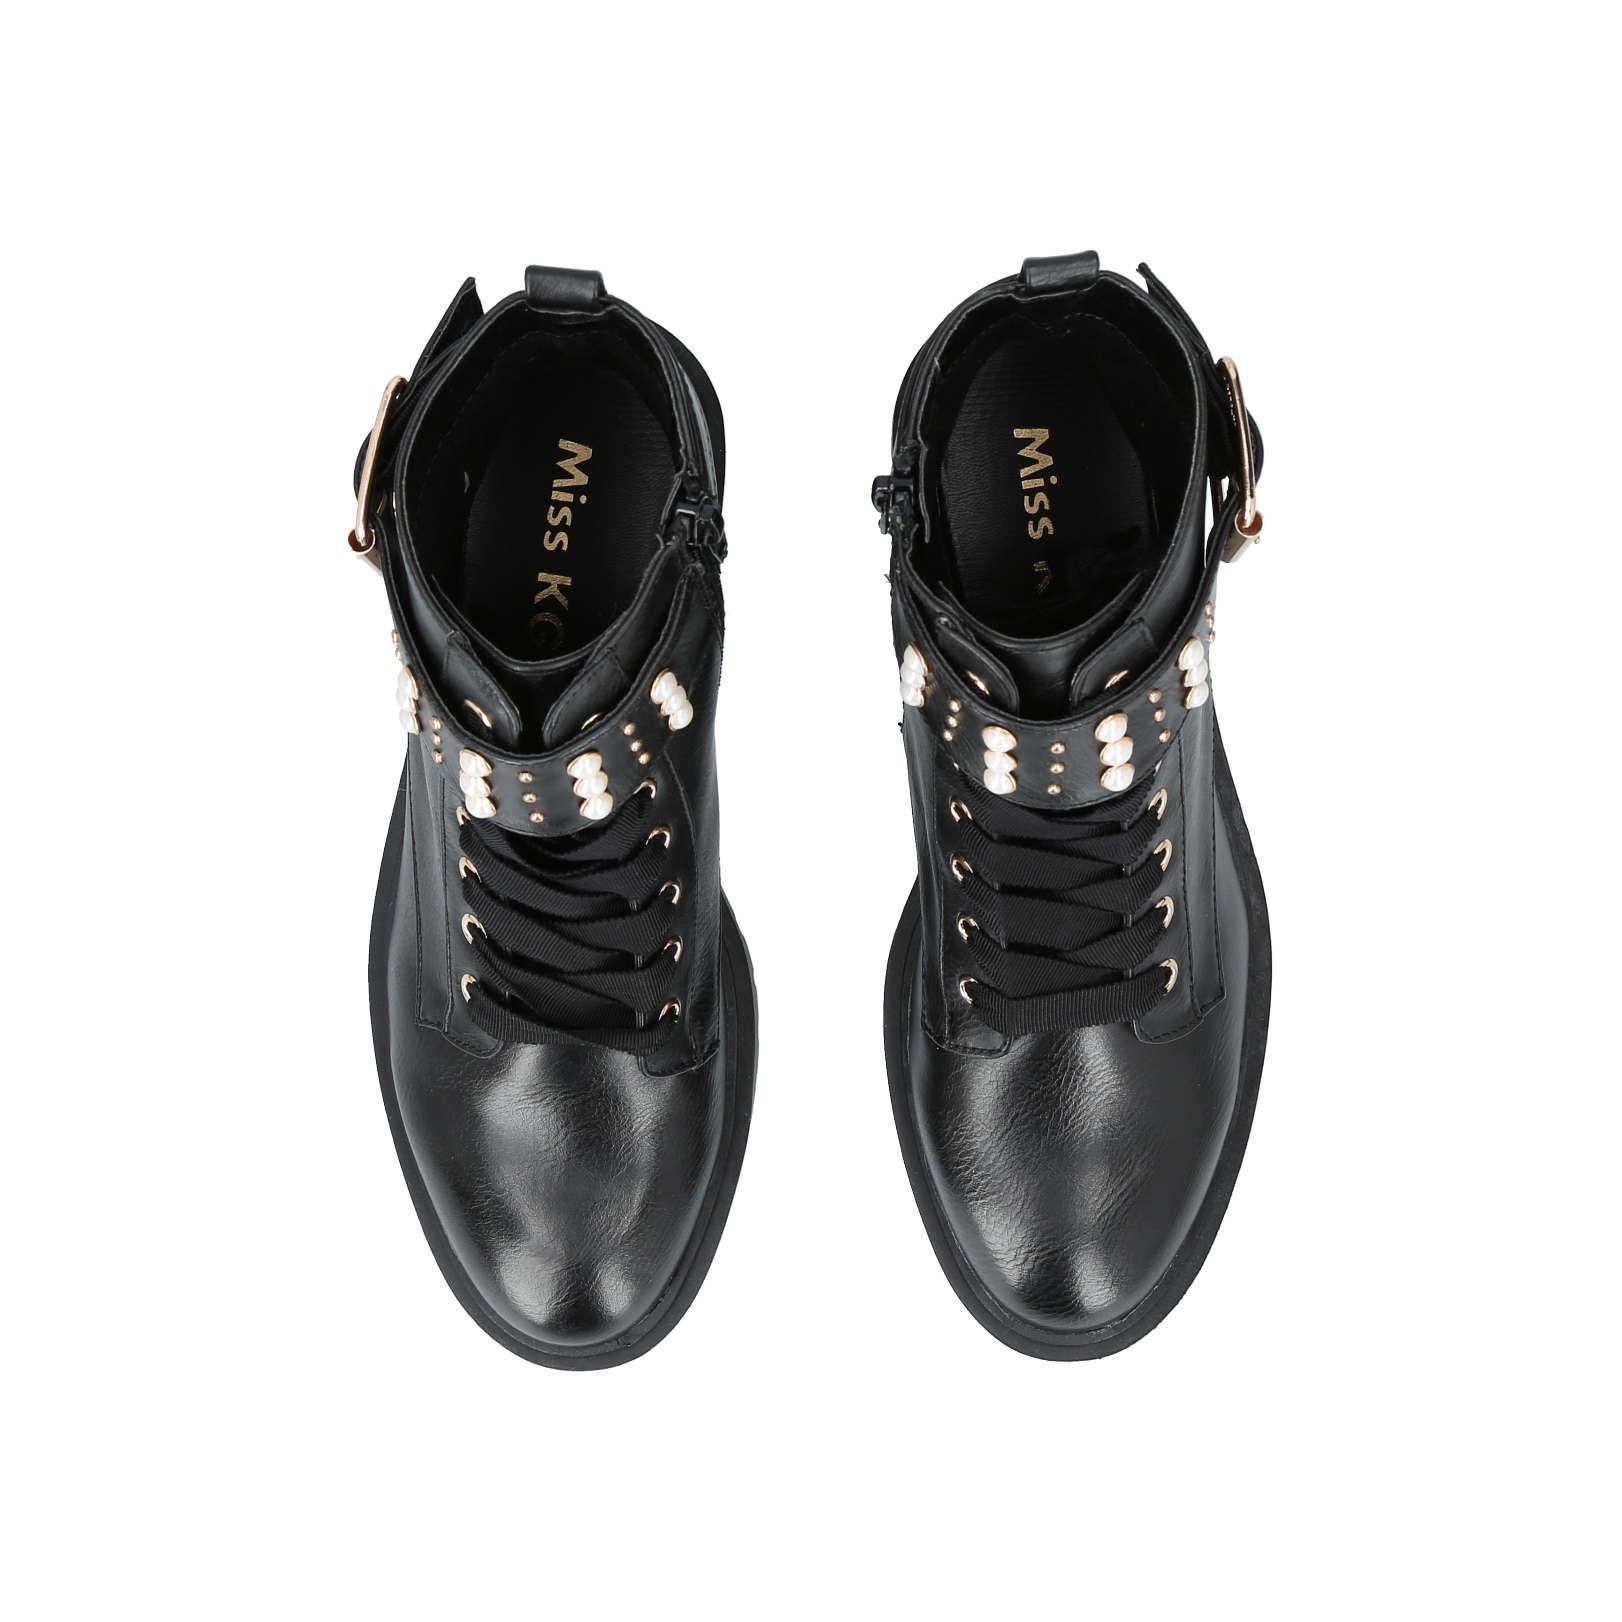 22670ab797f Women's Hatty Black Biker Boot Lace Up Boots